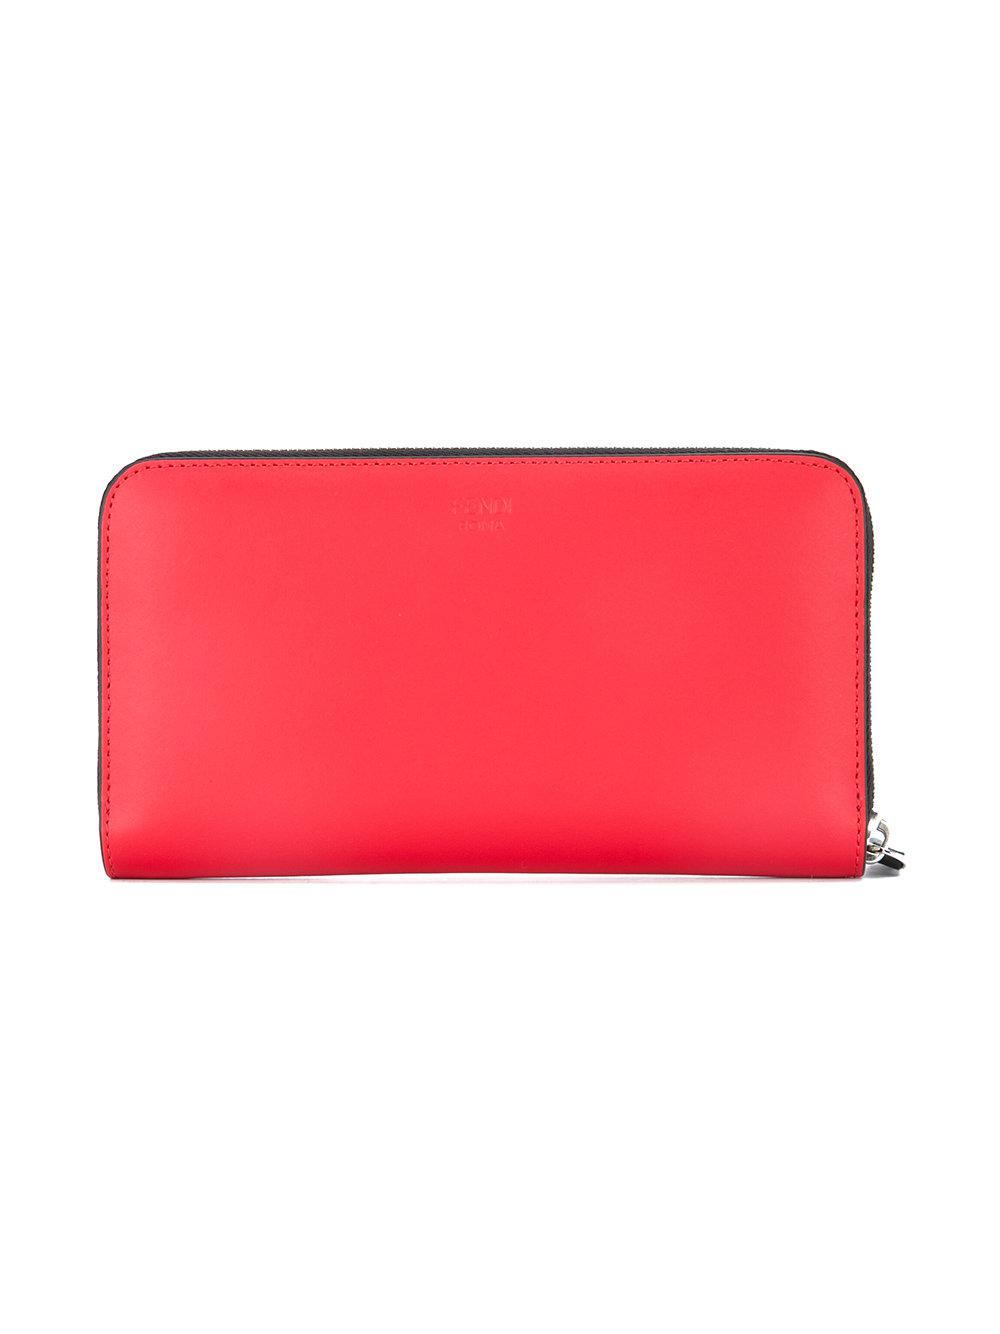 2efab871072d Fendi Bag Bugs-appliqué Wallet in Red for Men - Lyst